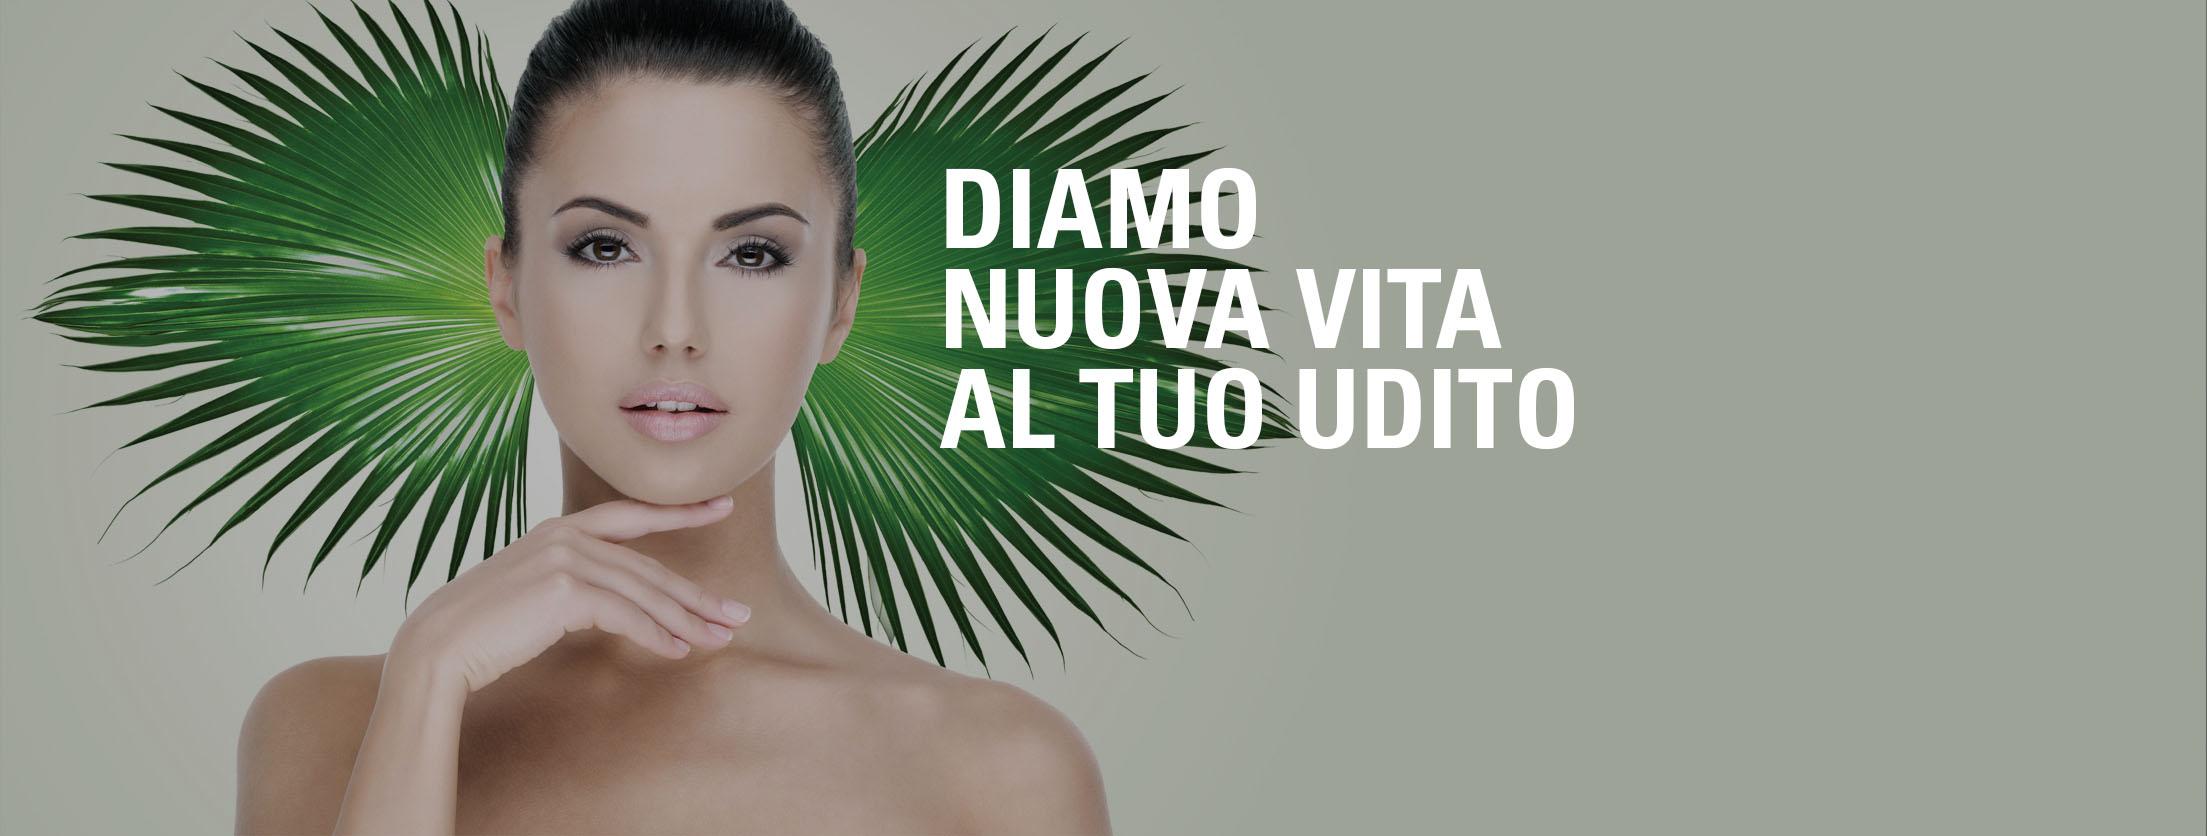 Udito_Finissimo_Apparecchi_Acustici_1B1_UDF